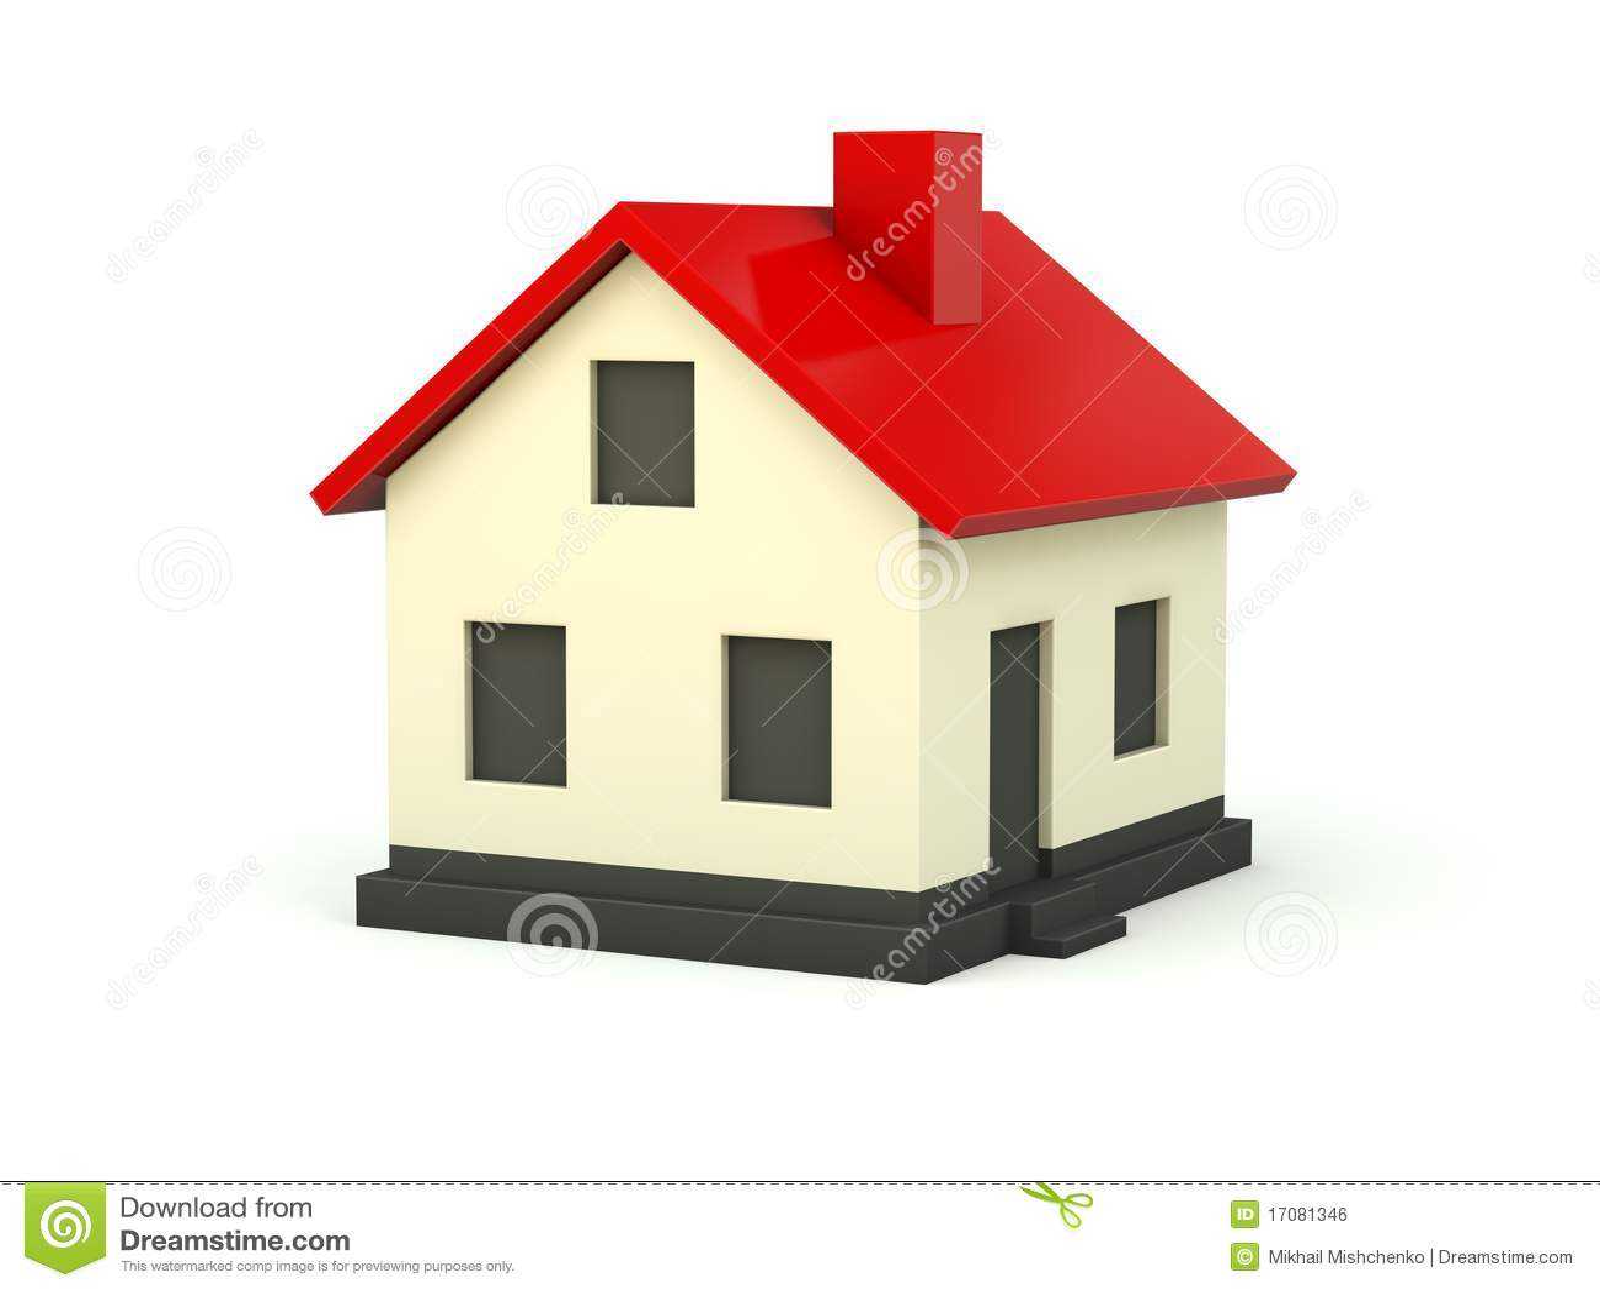 haus mit rotem dach lizenzfreies stockbild bild 17081346. Black Bedroom Furniture Sets. Home Design Ideas